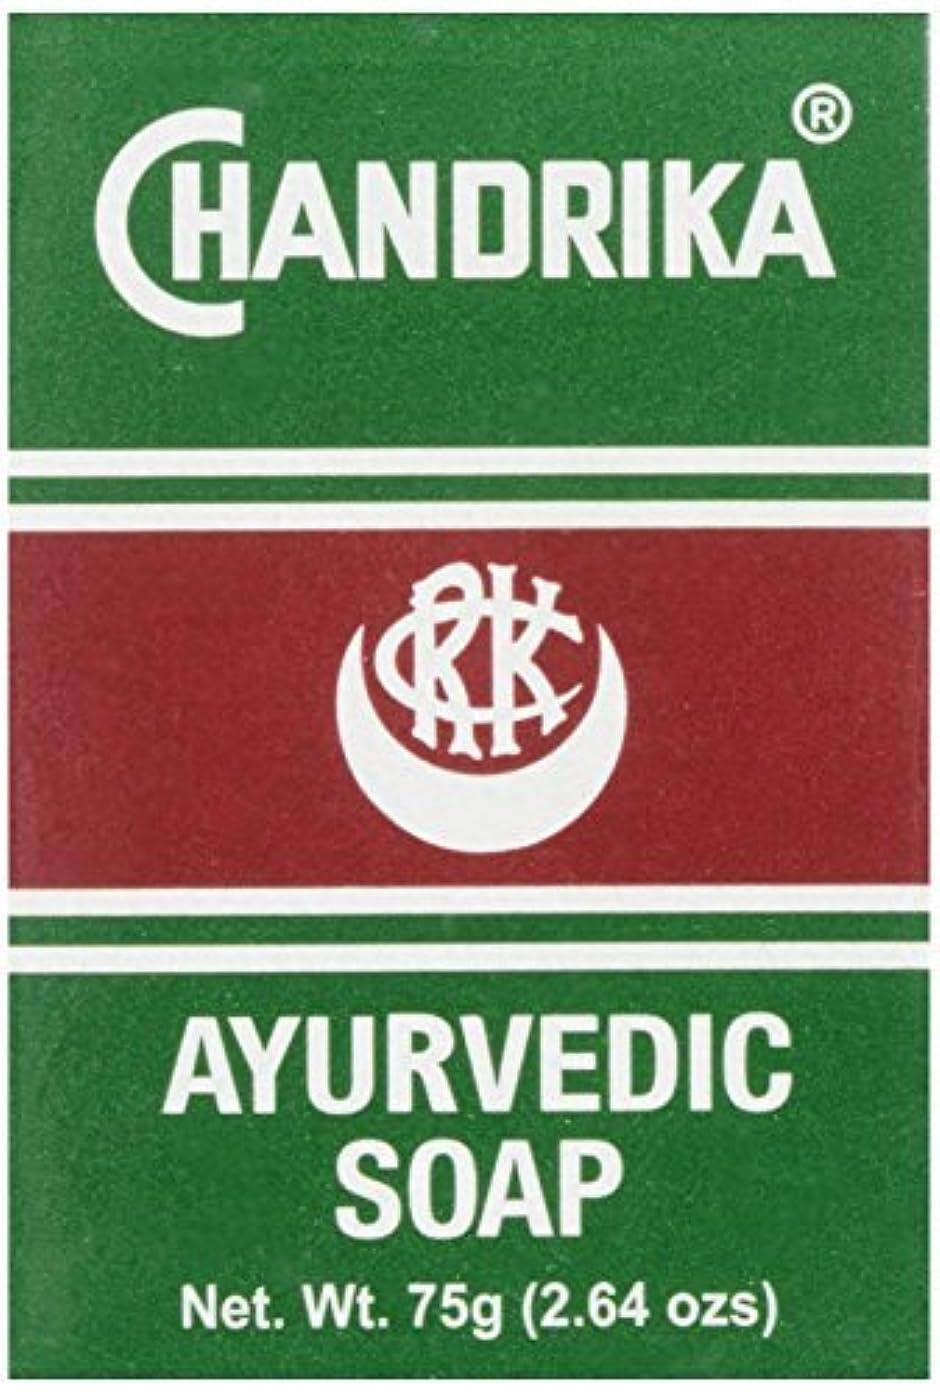 Ayuruedic Soap Chandrika 2.64 Oz Bar by Chandrika [並行輸入品]